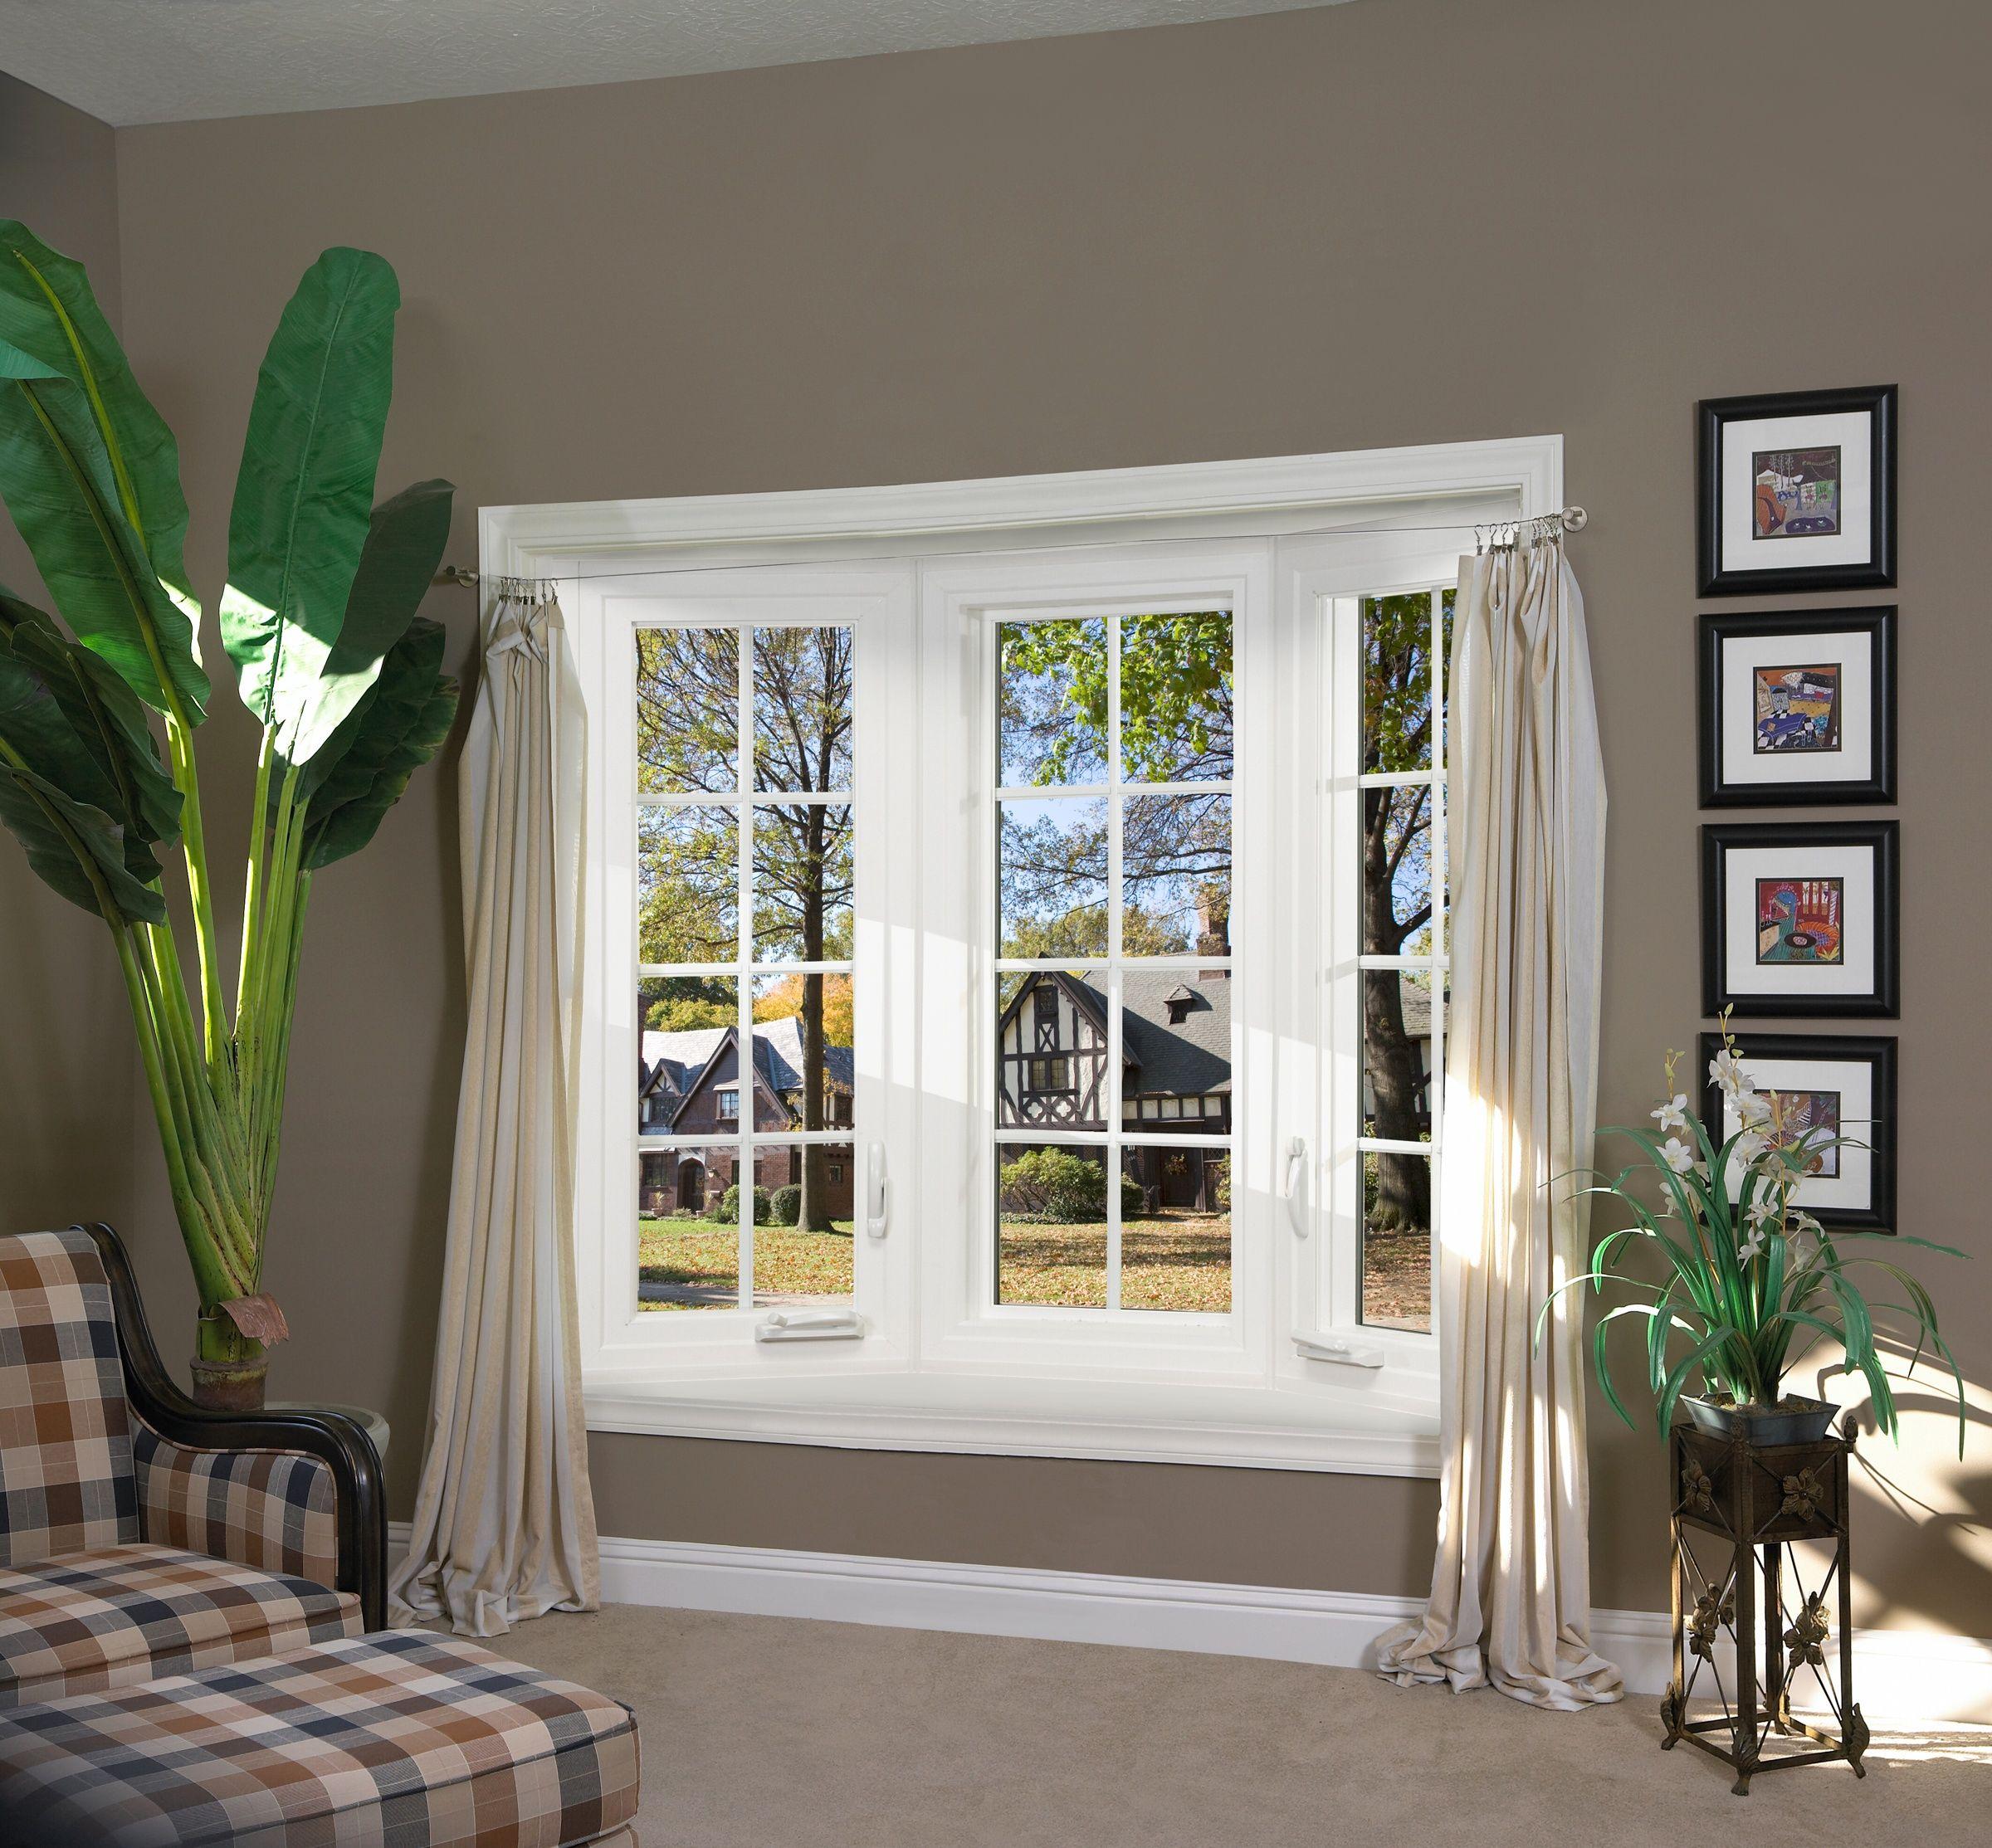 Window Design Ideas Bay Windows: Bay And Bow Windows. Double Glazed Windows Melbourne